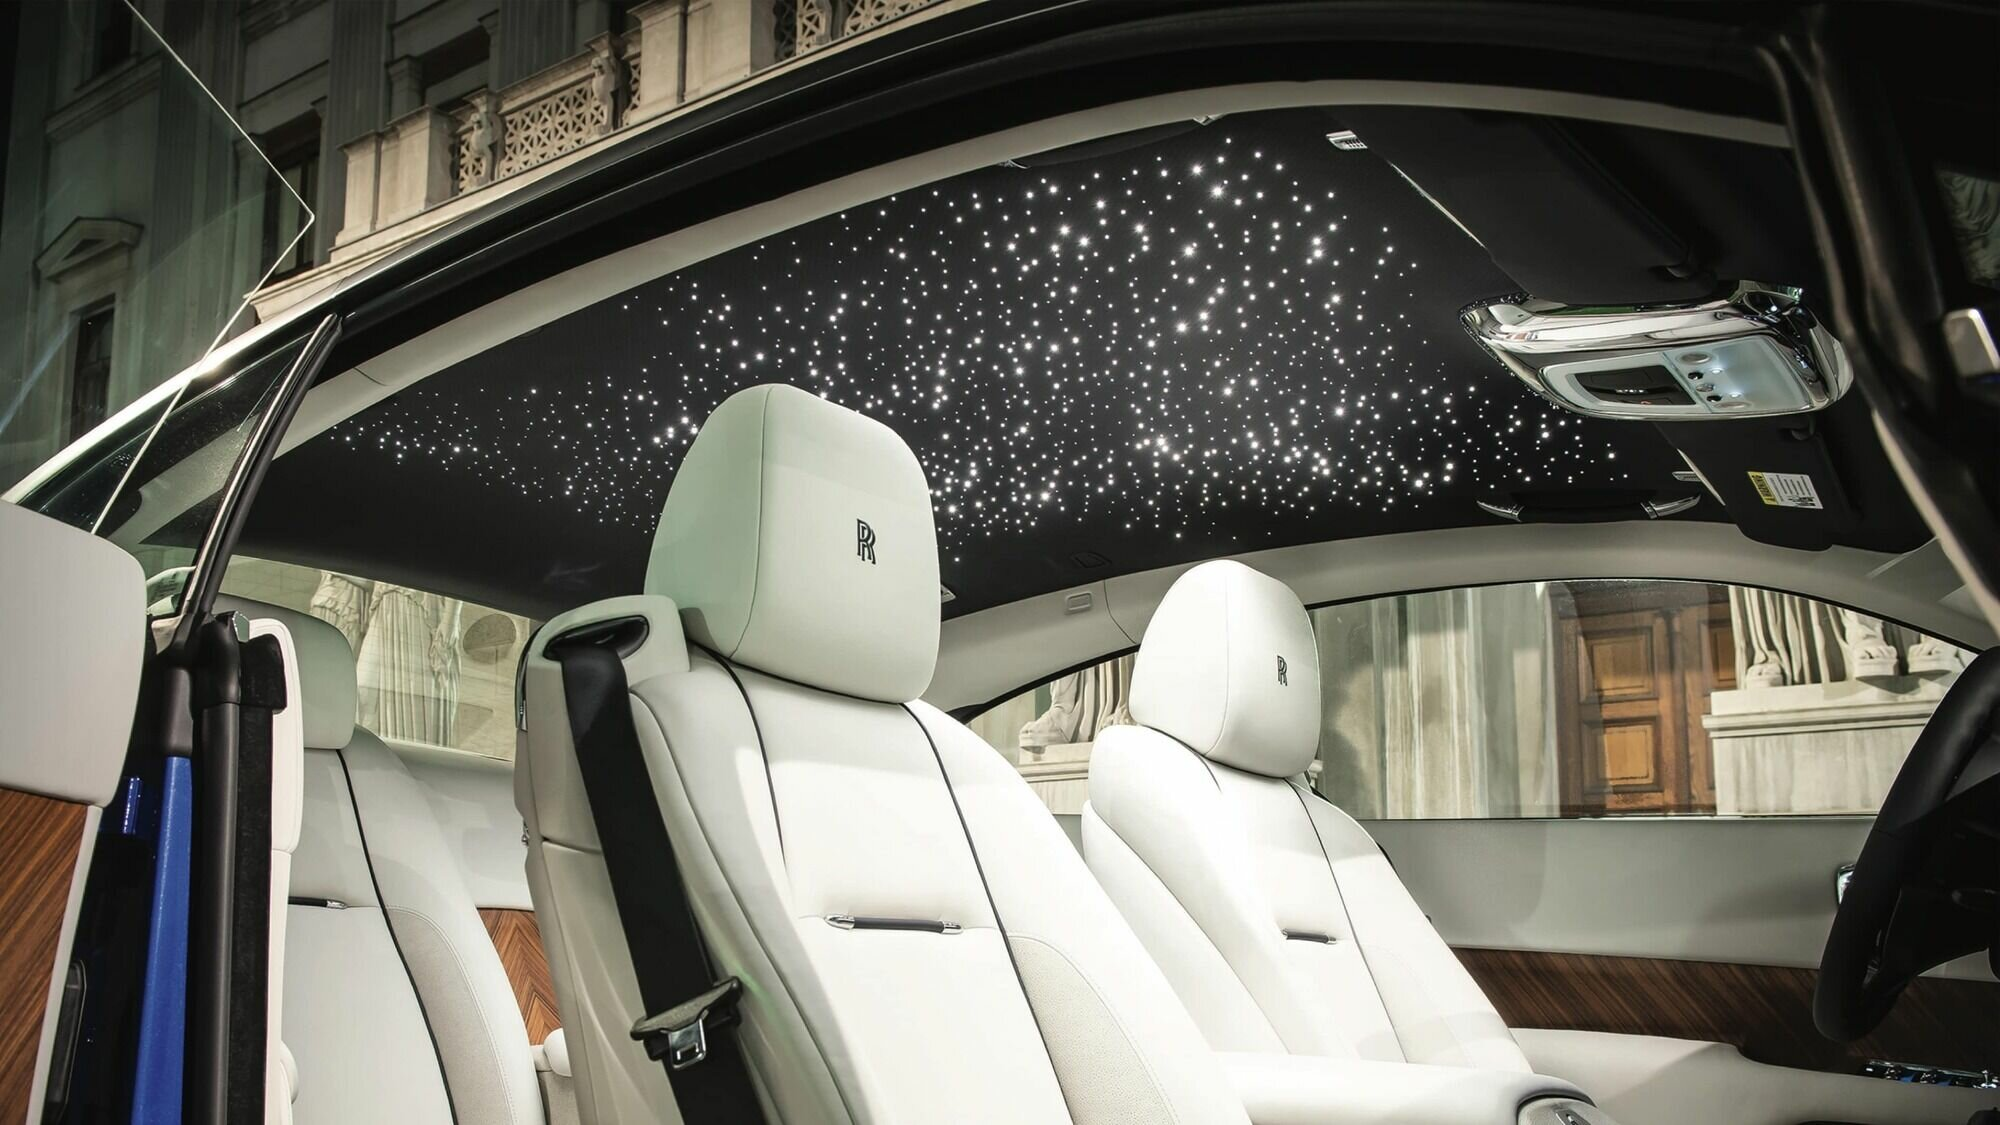 Потолок в салоне Rolls-Royce